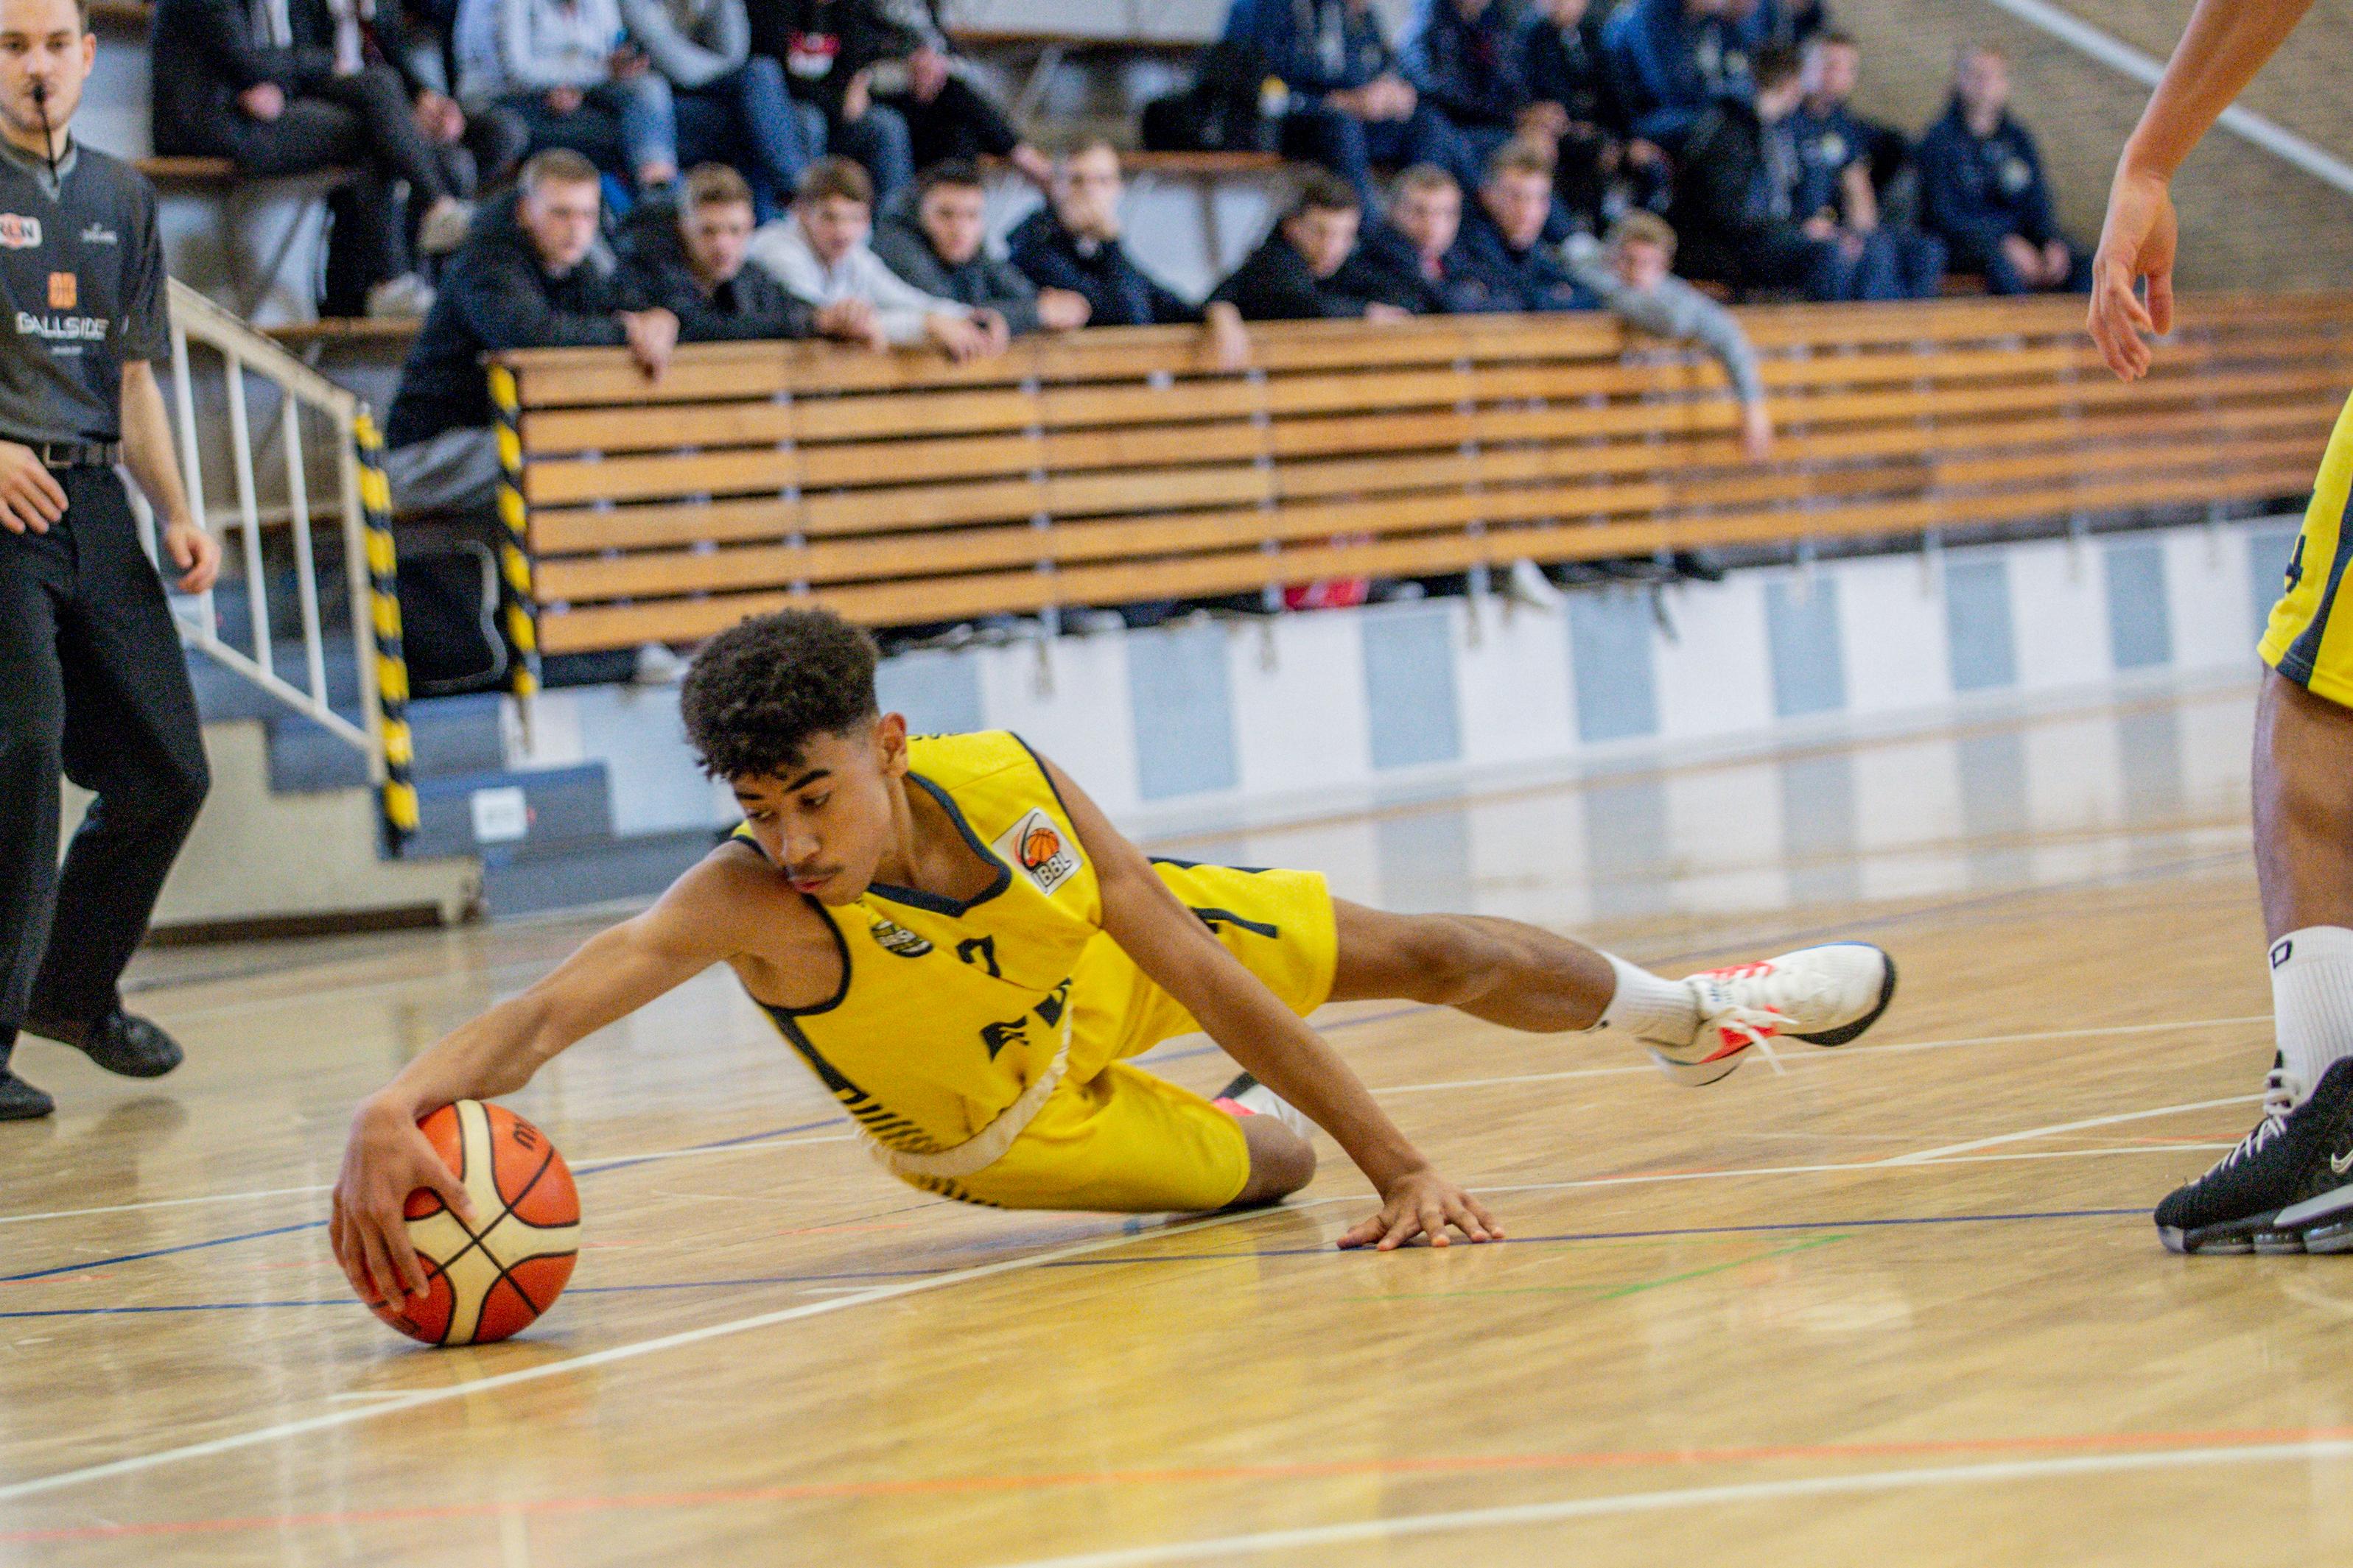 13.10.2019, Oldenburg, Sporthalle Haarenufer: JBBL | EWE Baskets Juniors - Phoenix Hagen Youngsters  //  Tyrell NWAKI (#7 EWE Baskets Juniors/JBBL)  || Foto: Erik Hillmer